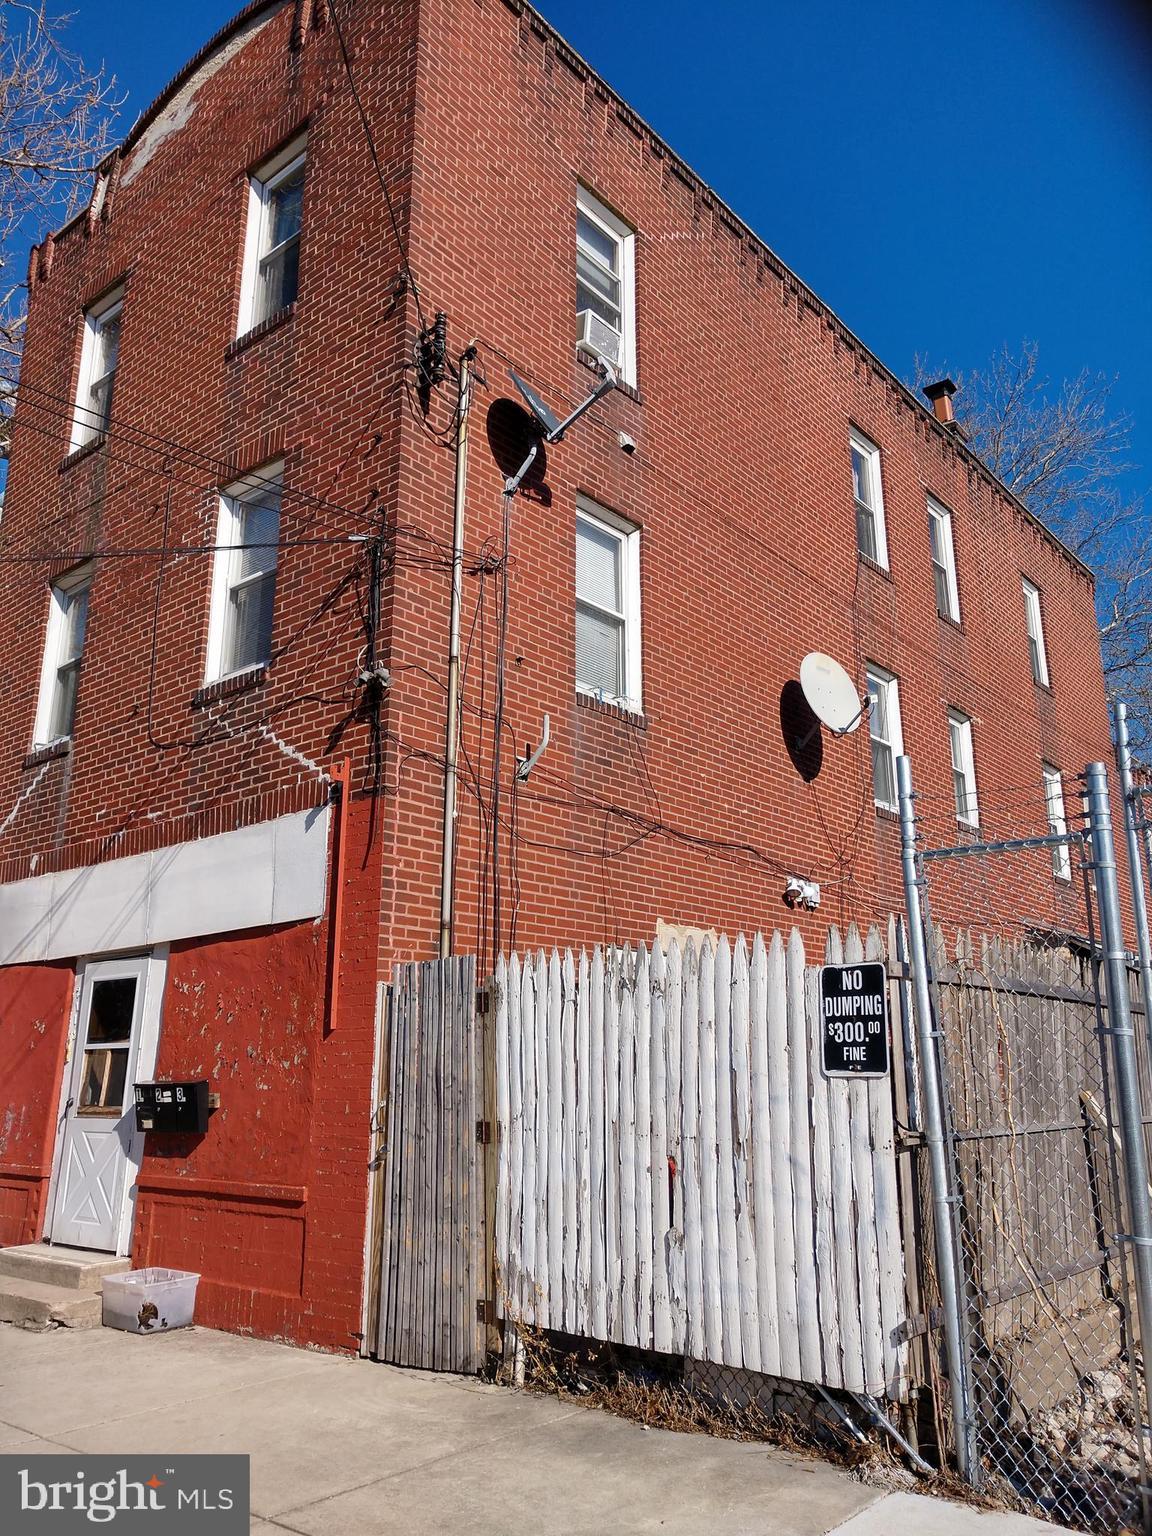 2113 S 28TH STREET, PHILADELPHIA, PA 19145